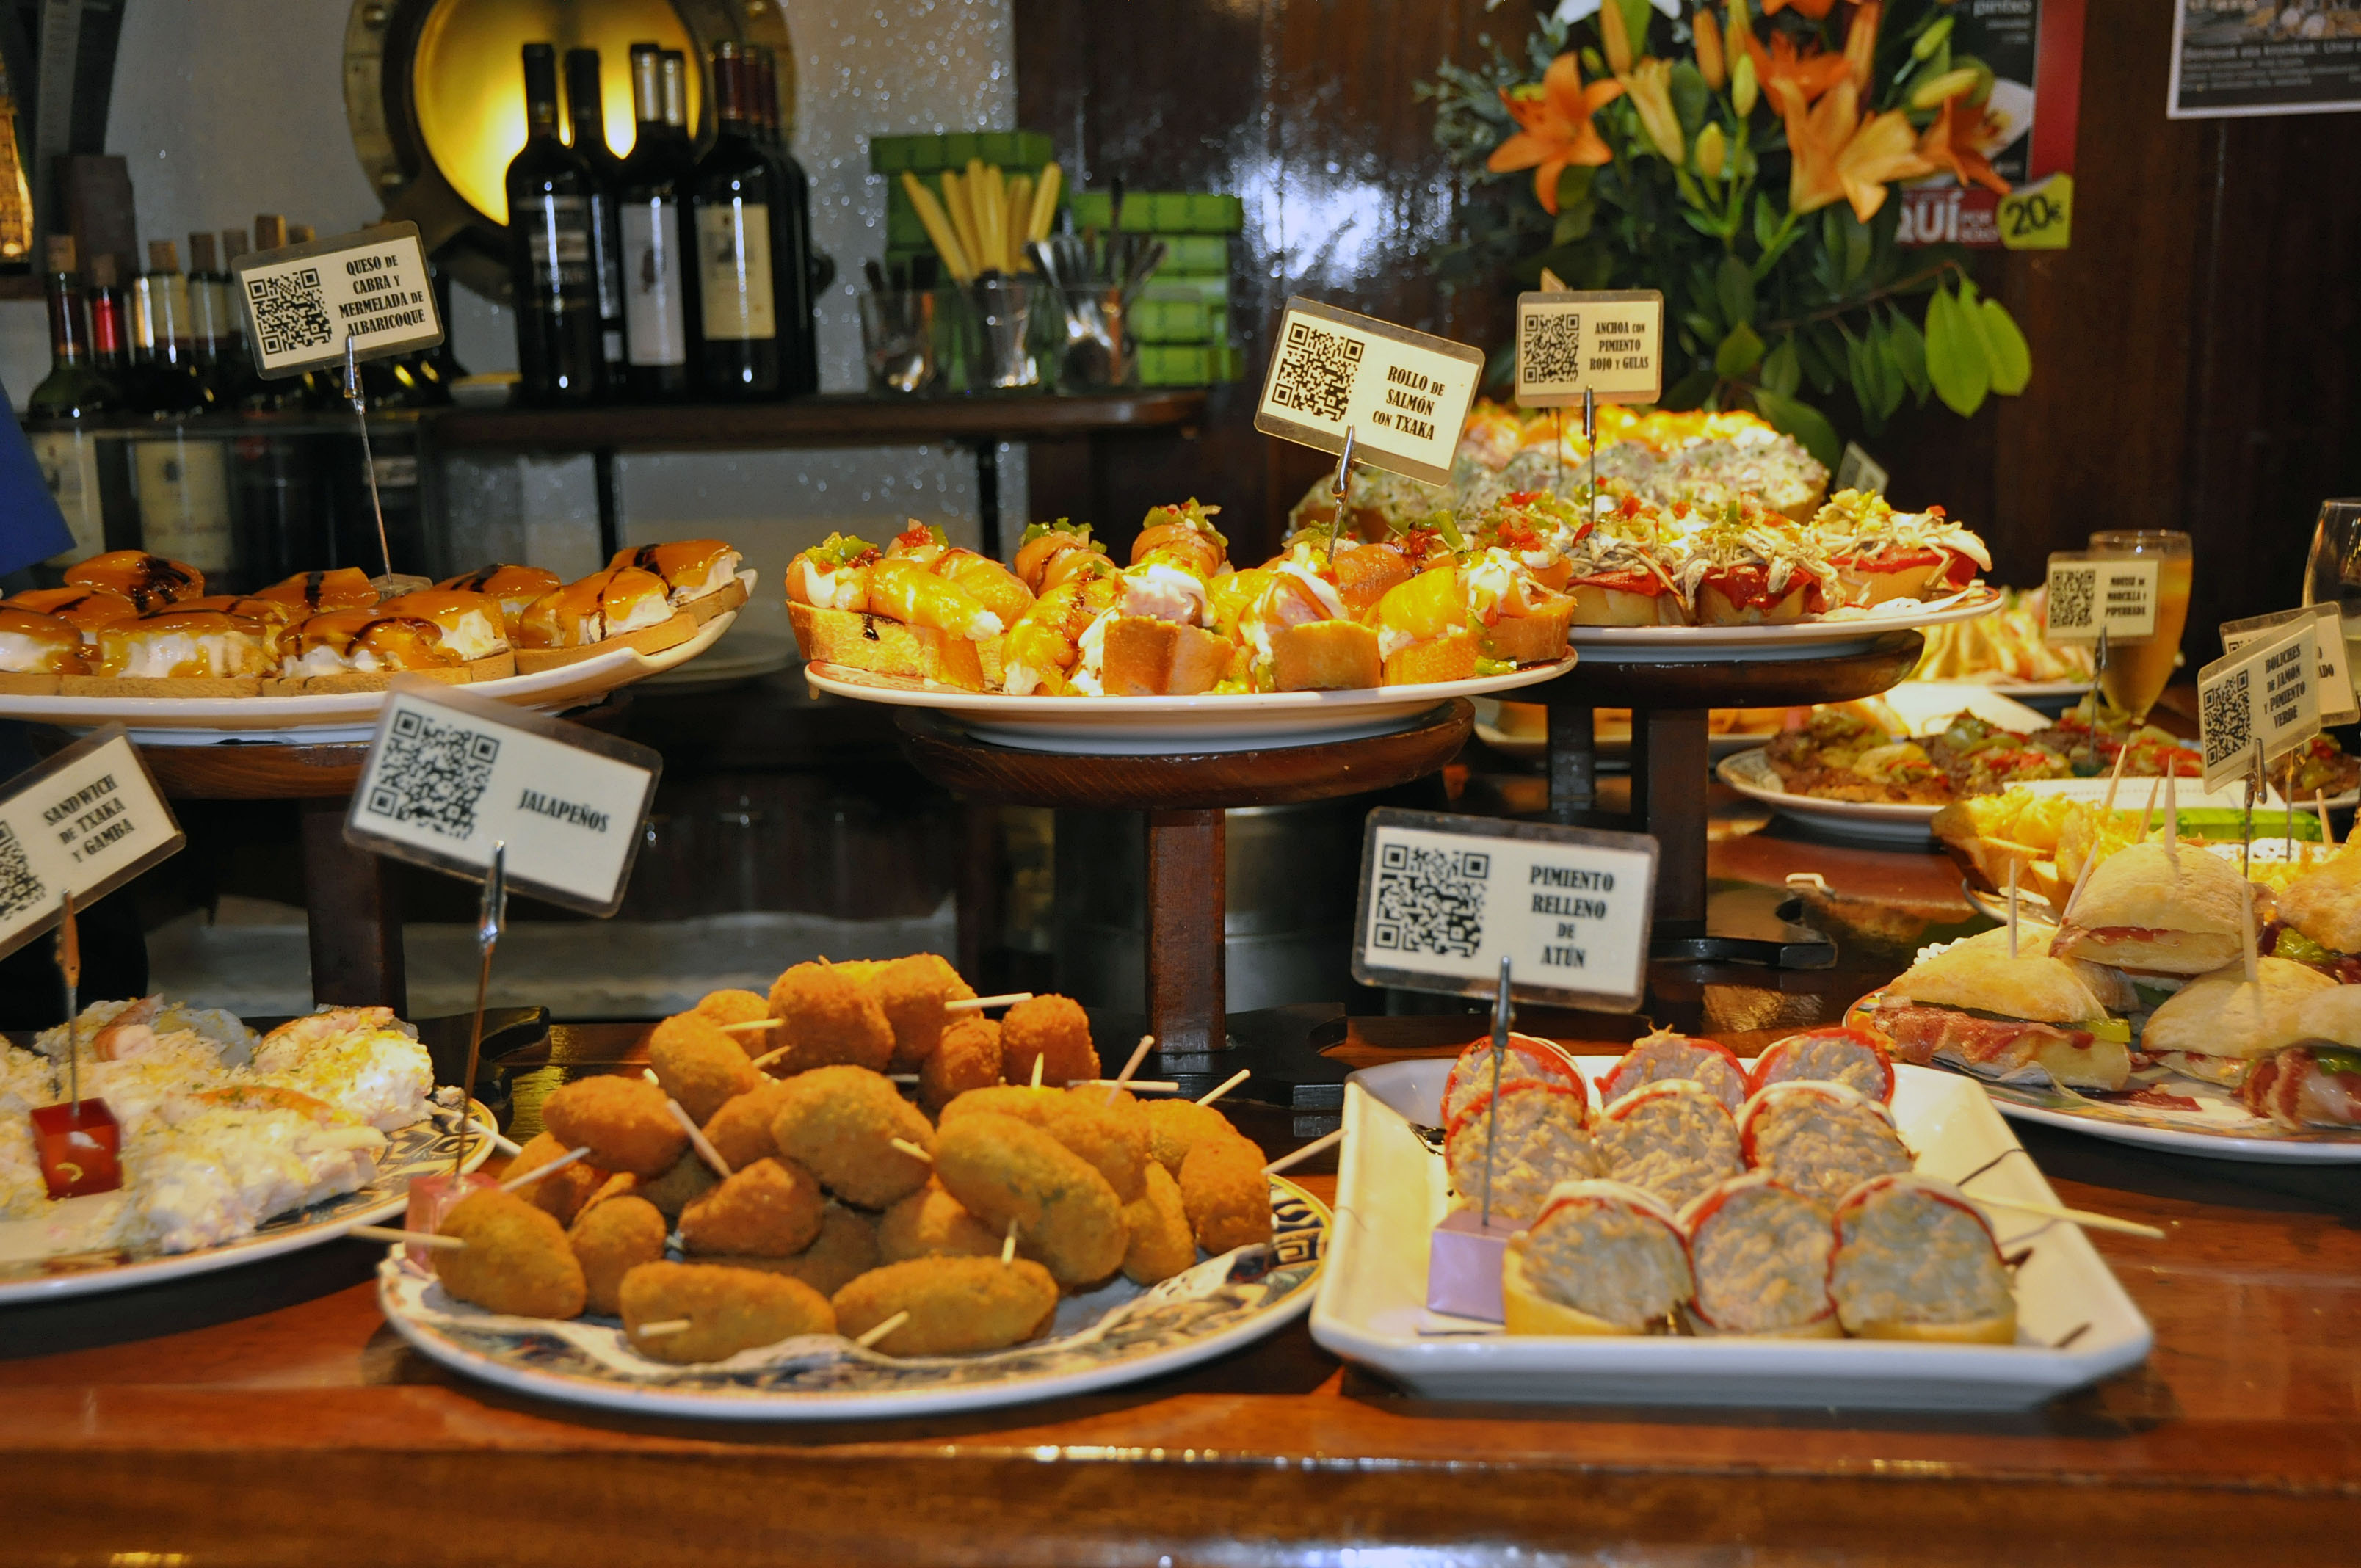 Castro-Urdiales, Donostia, Hiszpania, Podróże, san sebastian, Santillana del Mar